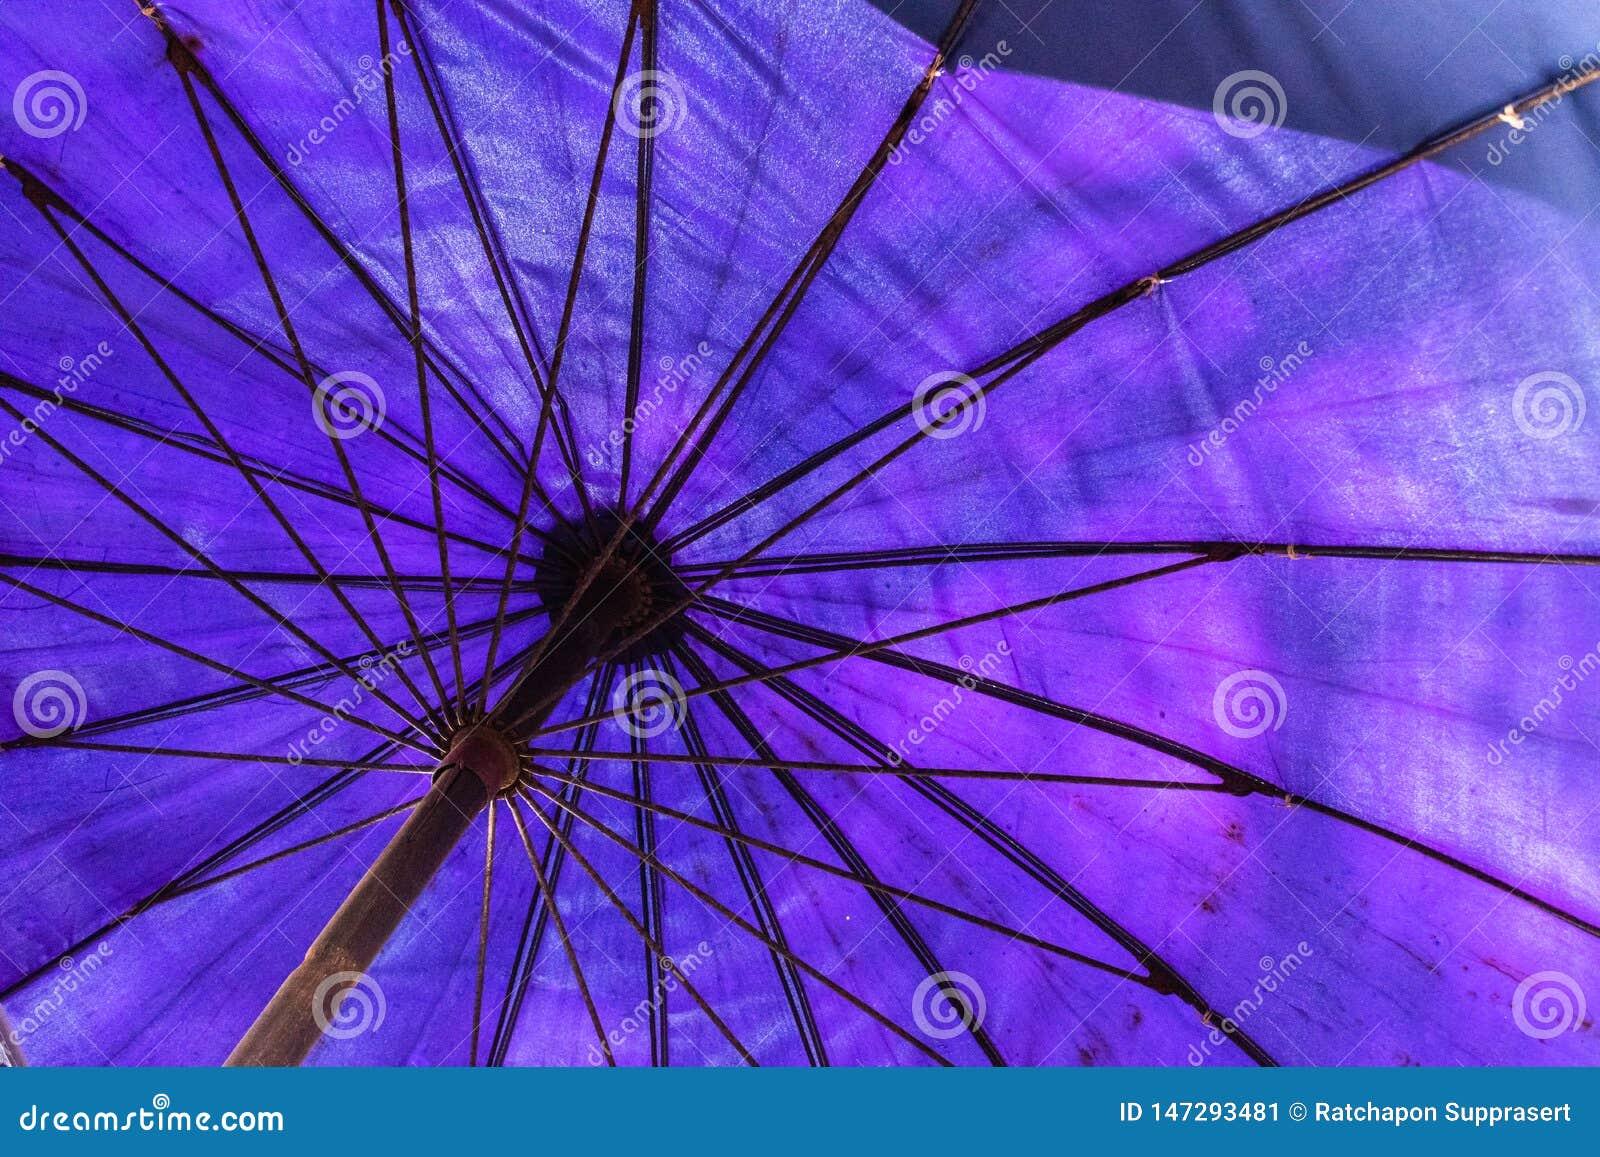 Large blue umbrella on the beach